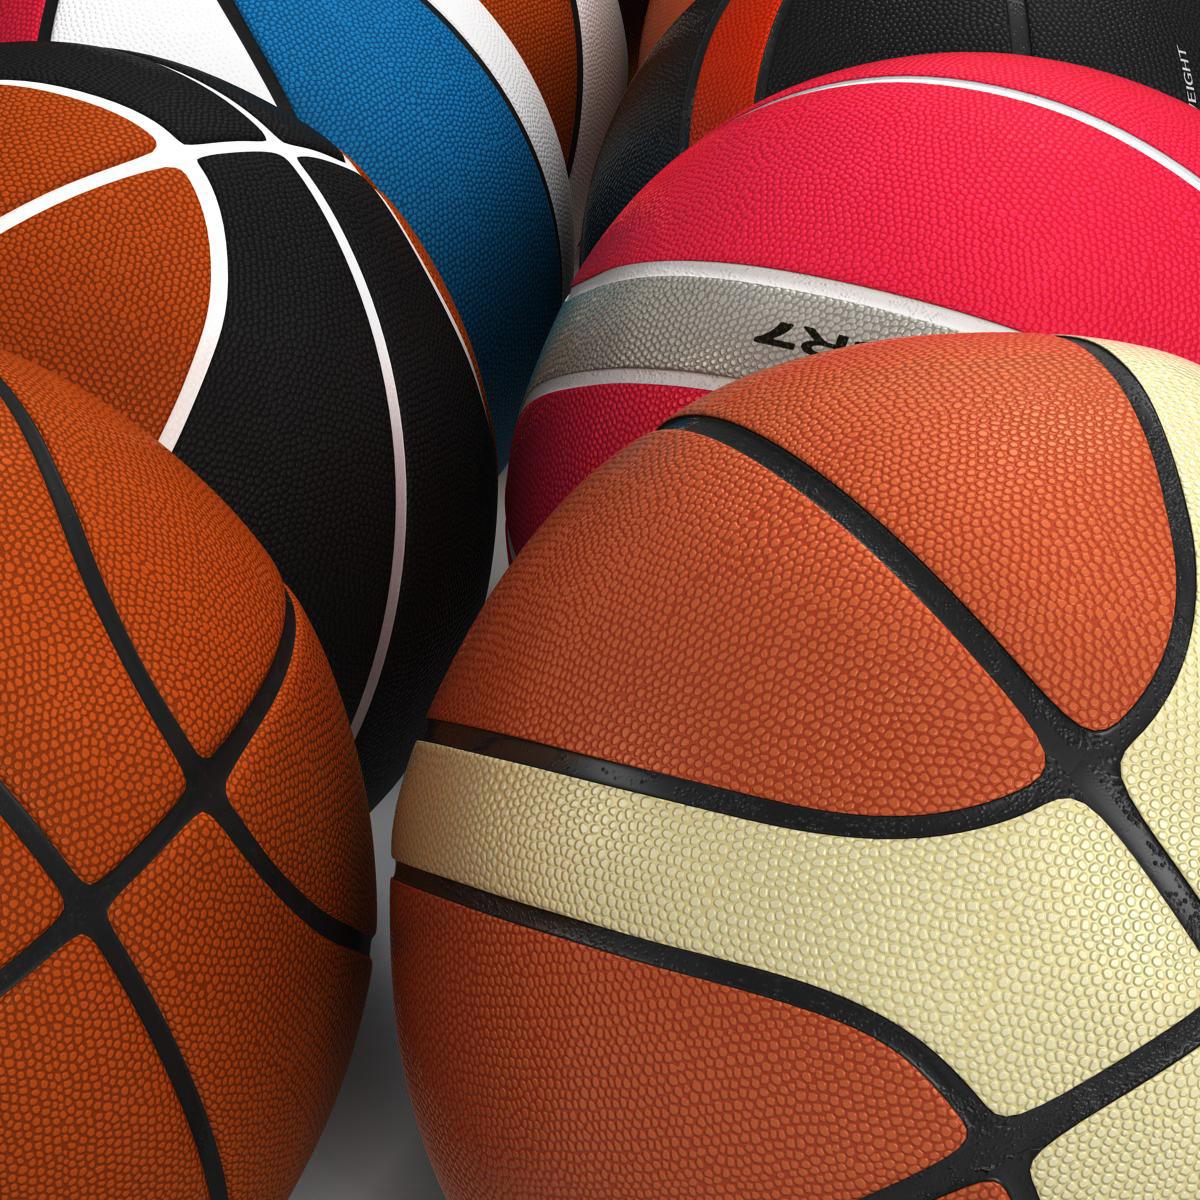 basketbola bumbu komplekts 3d modelis 3ds max fbx c4d ma mb obj 165934